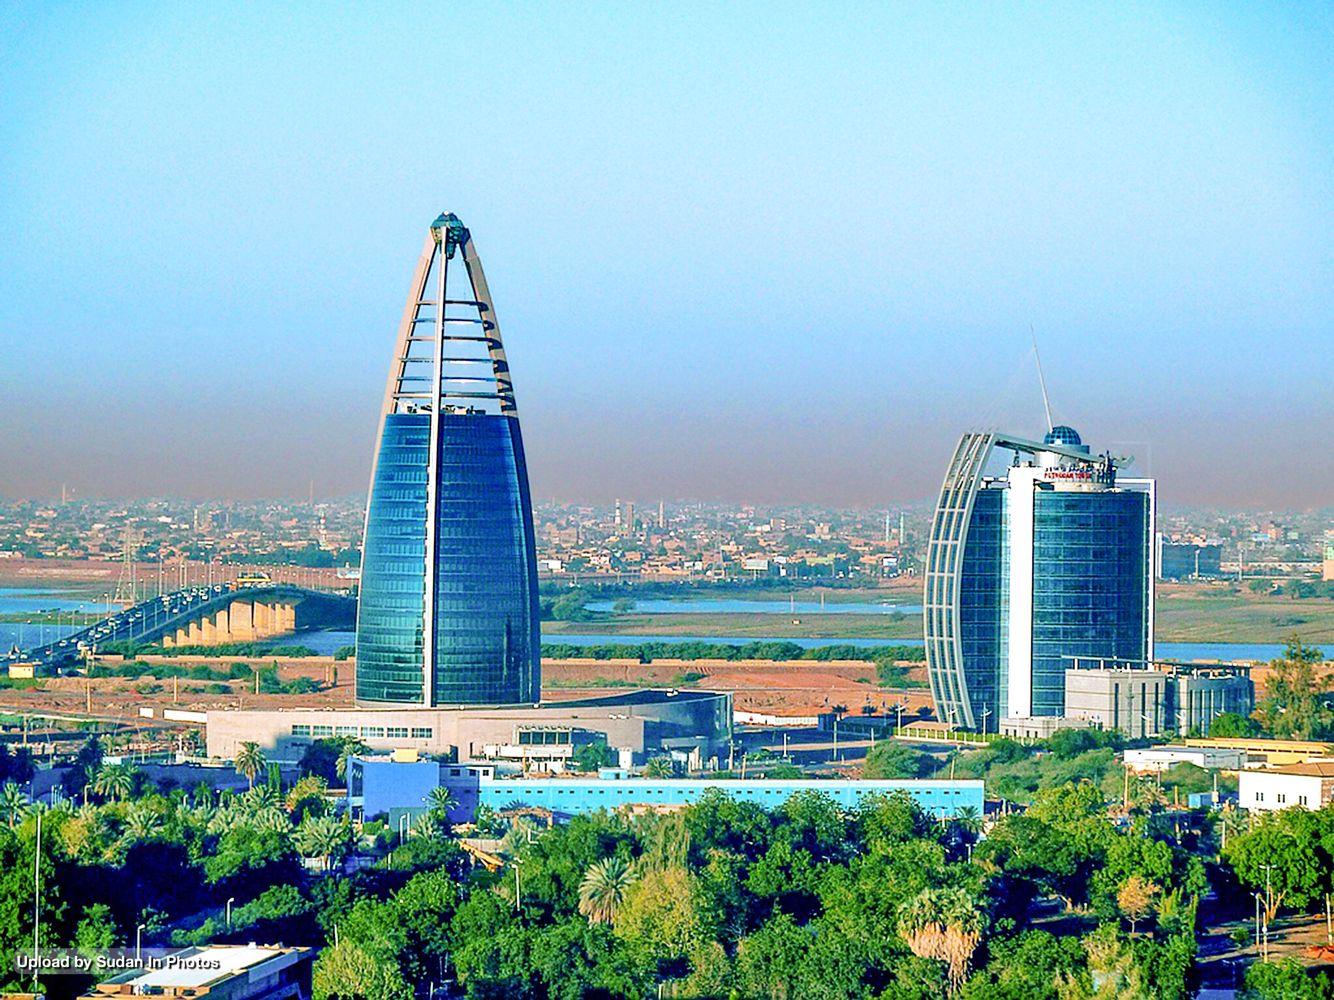 Khartoum, Sudans capital الخرطوم، عاصمة السودان sudan khartoum capital